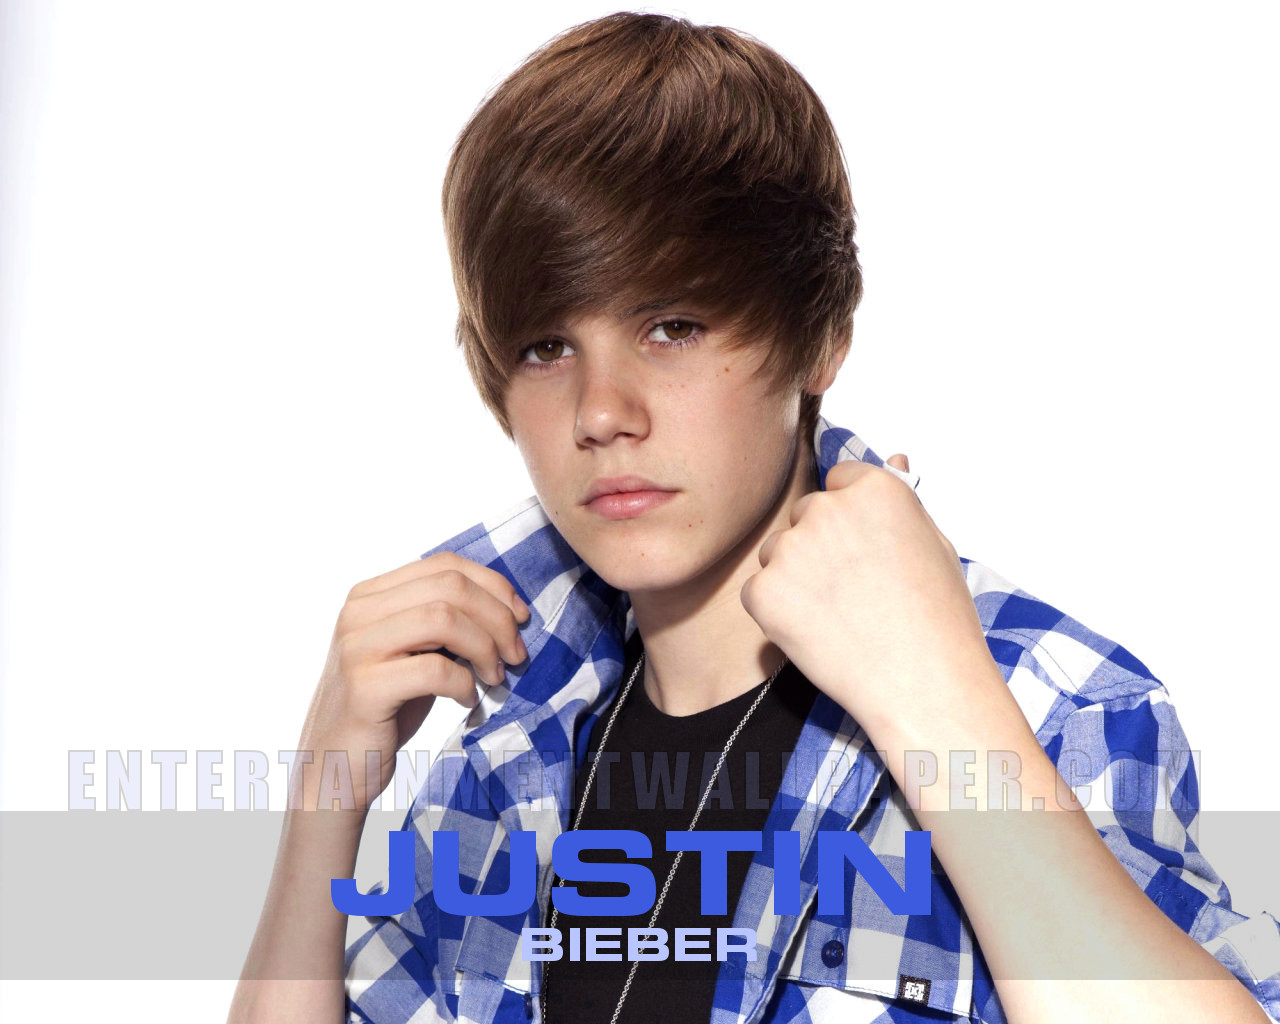 http://3.bp.blogspot.com/-AcRE0VR0gfk/TedZHKgkGSI/AAAAAAAAEtE/7hCkCjebRrI/s1600/Justin+Bieber+-+2+Wallpaper.jpg